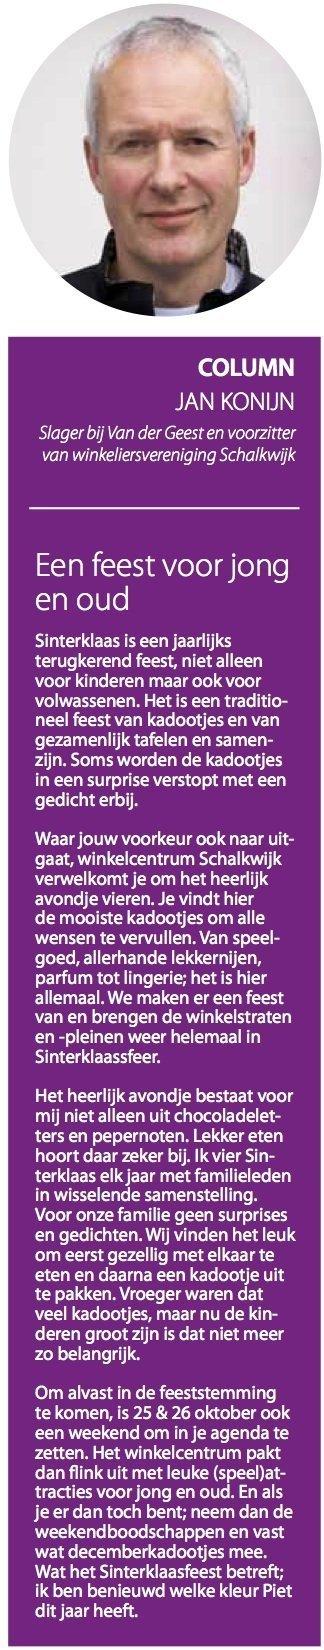 Column_JanKonijn